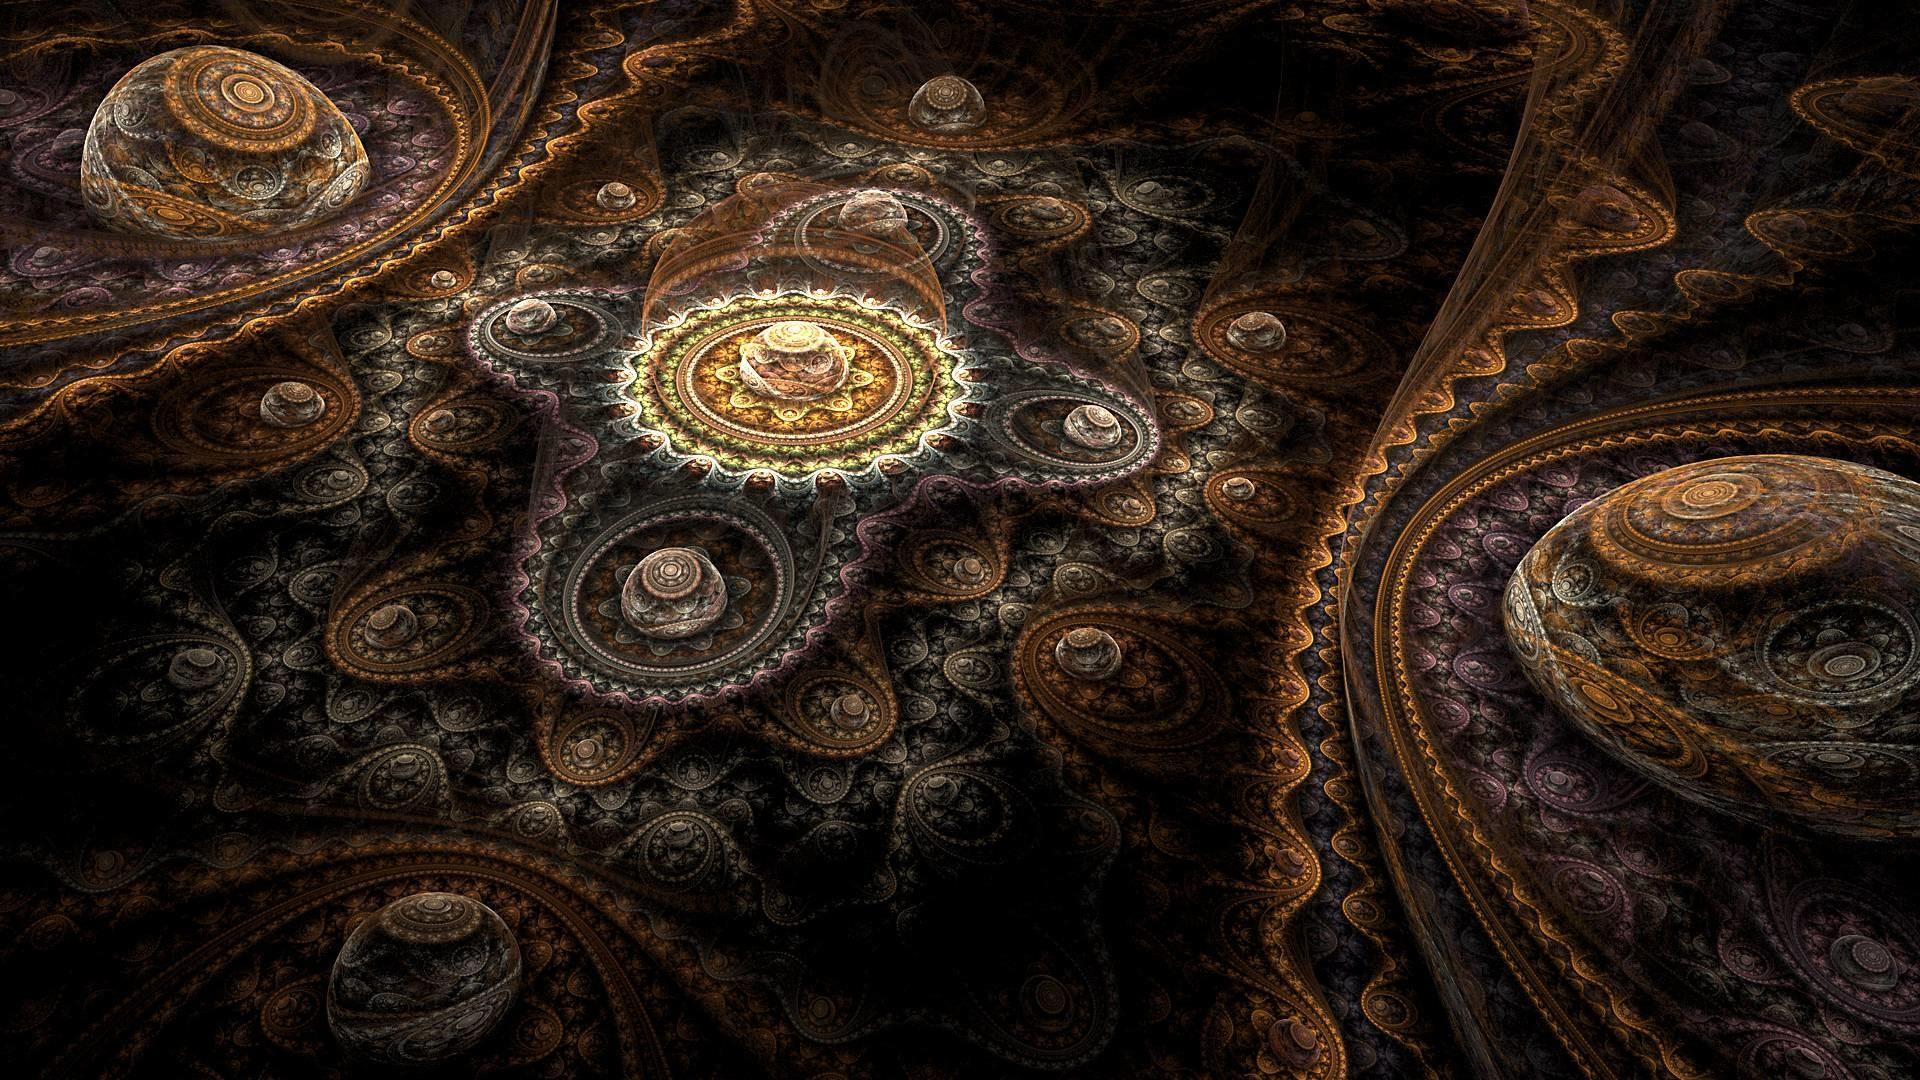 Miscellaneous Steampunk Wallpapers Mechanical Eye Iphone Wallpaper .